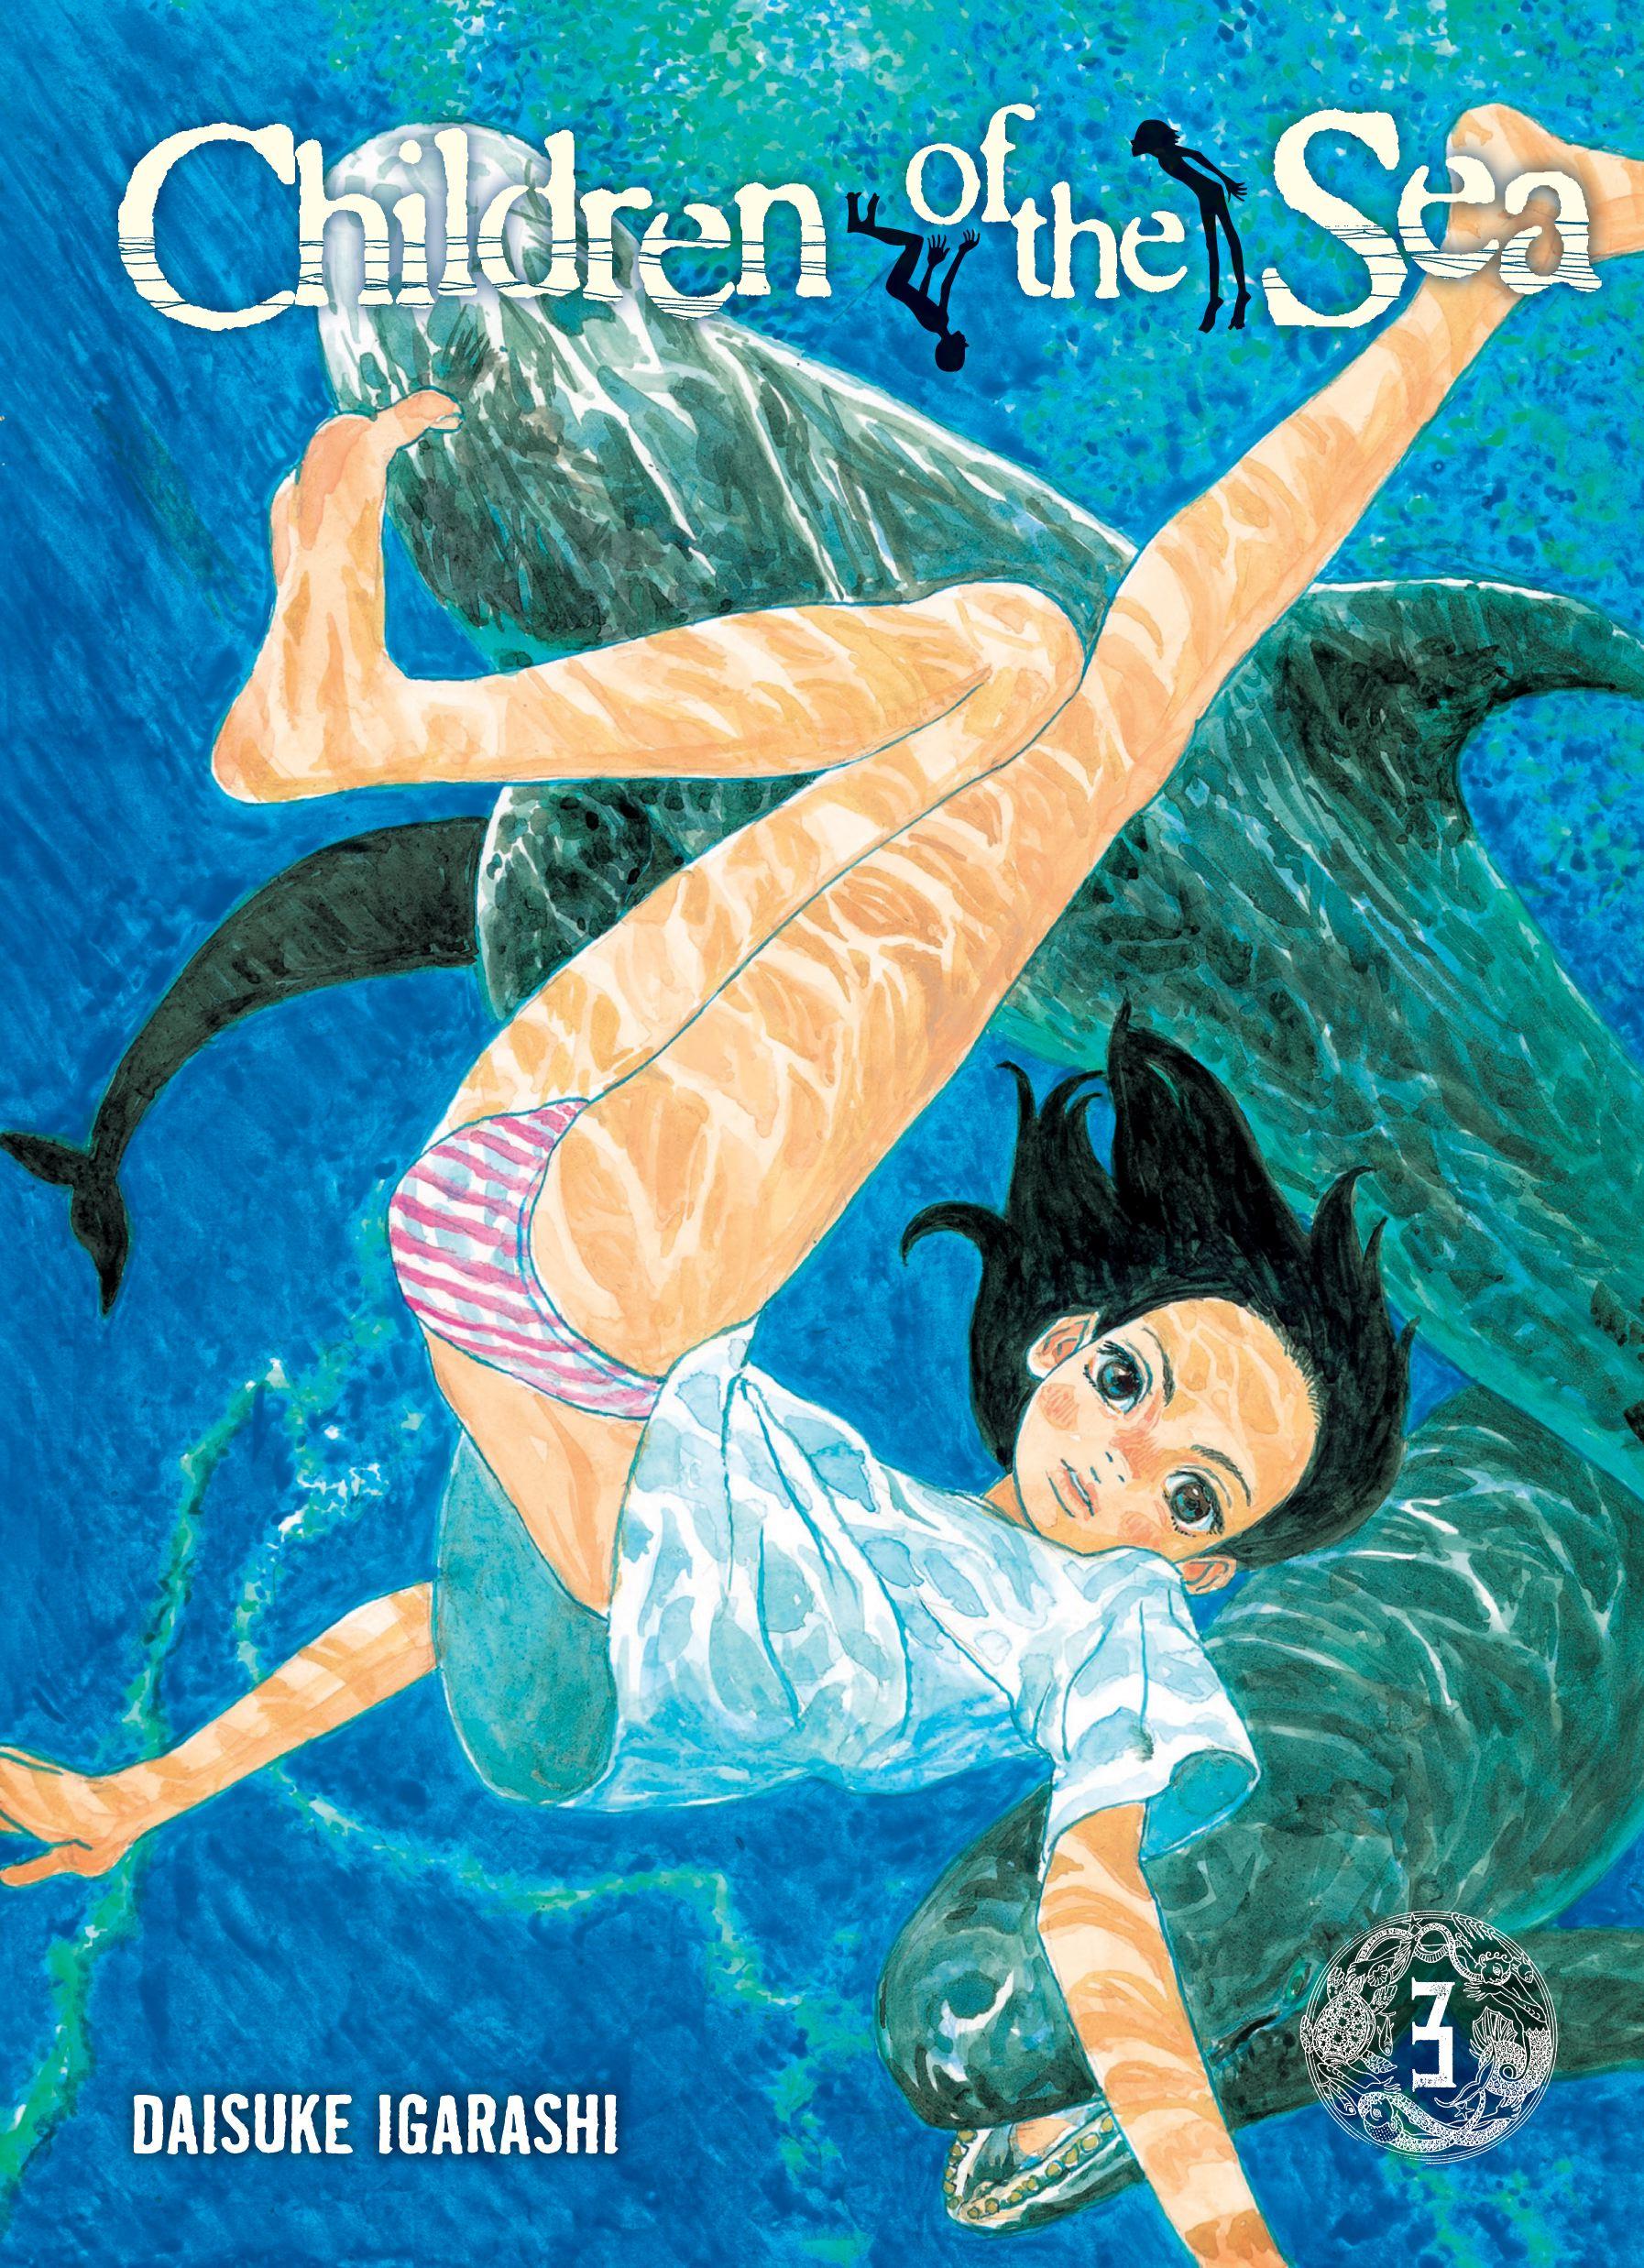 Children of the sea vol 3 9781421529202 hr